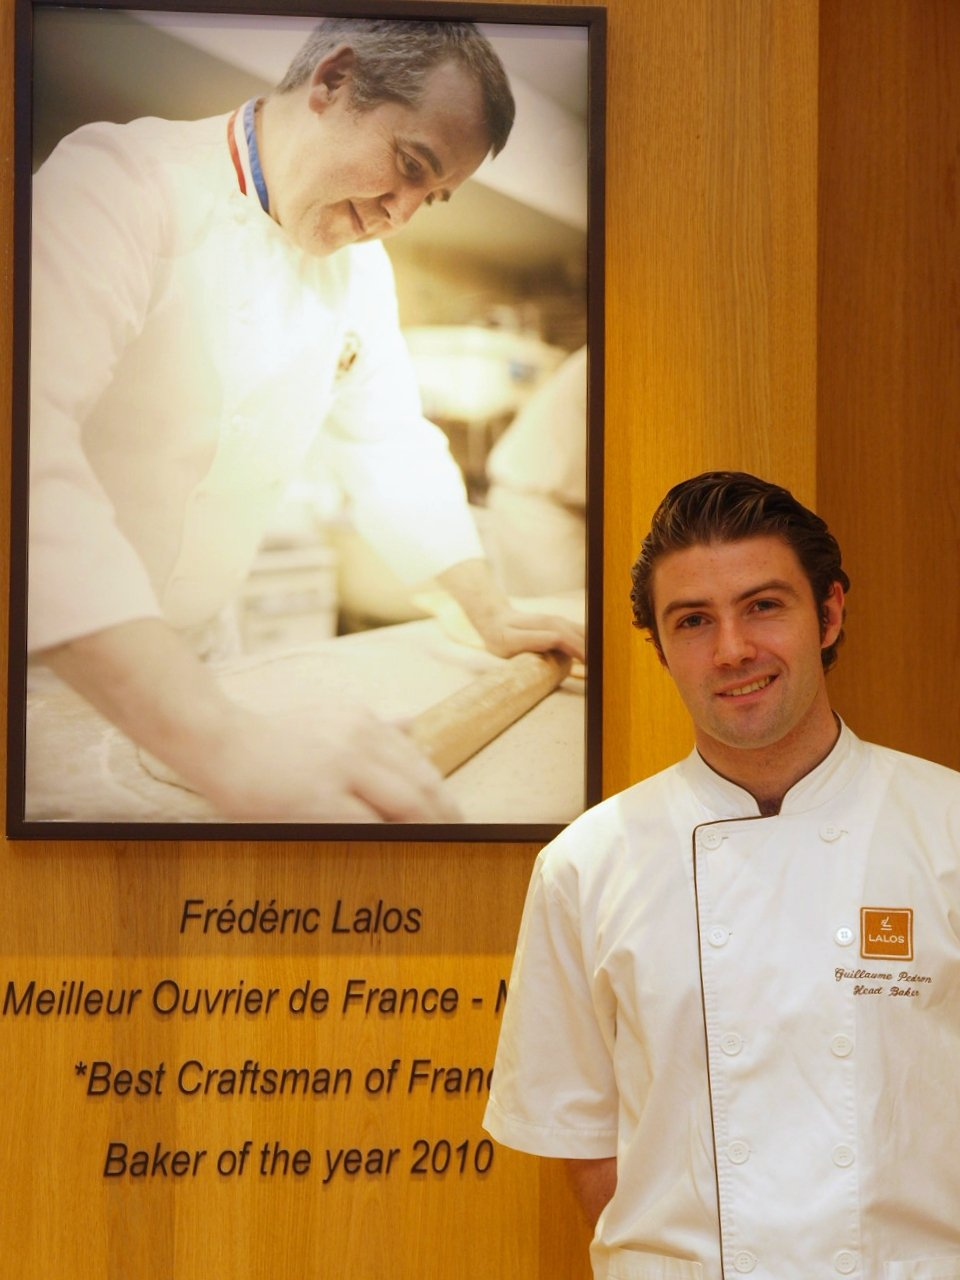 Guillaume自告奮勇進入Lalos Bakery,年僅21歲即成為最年輕主...